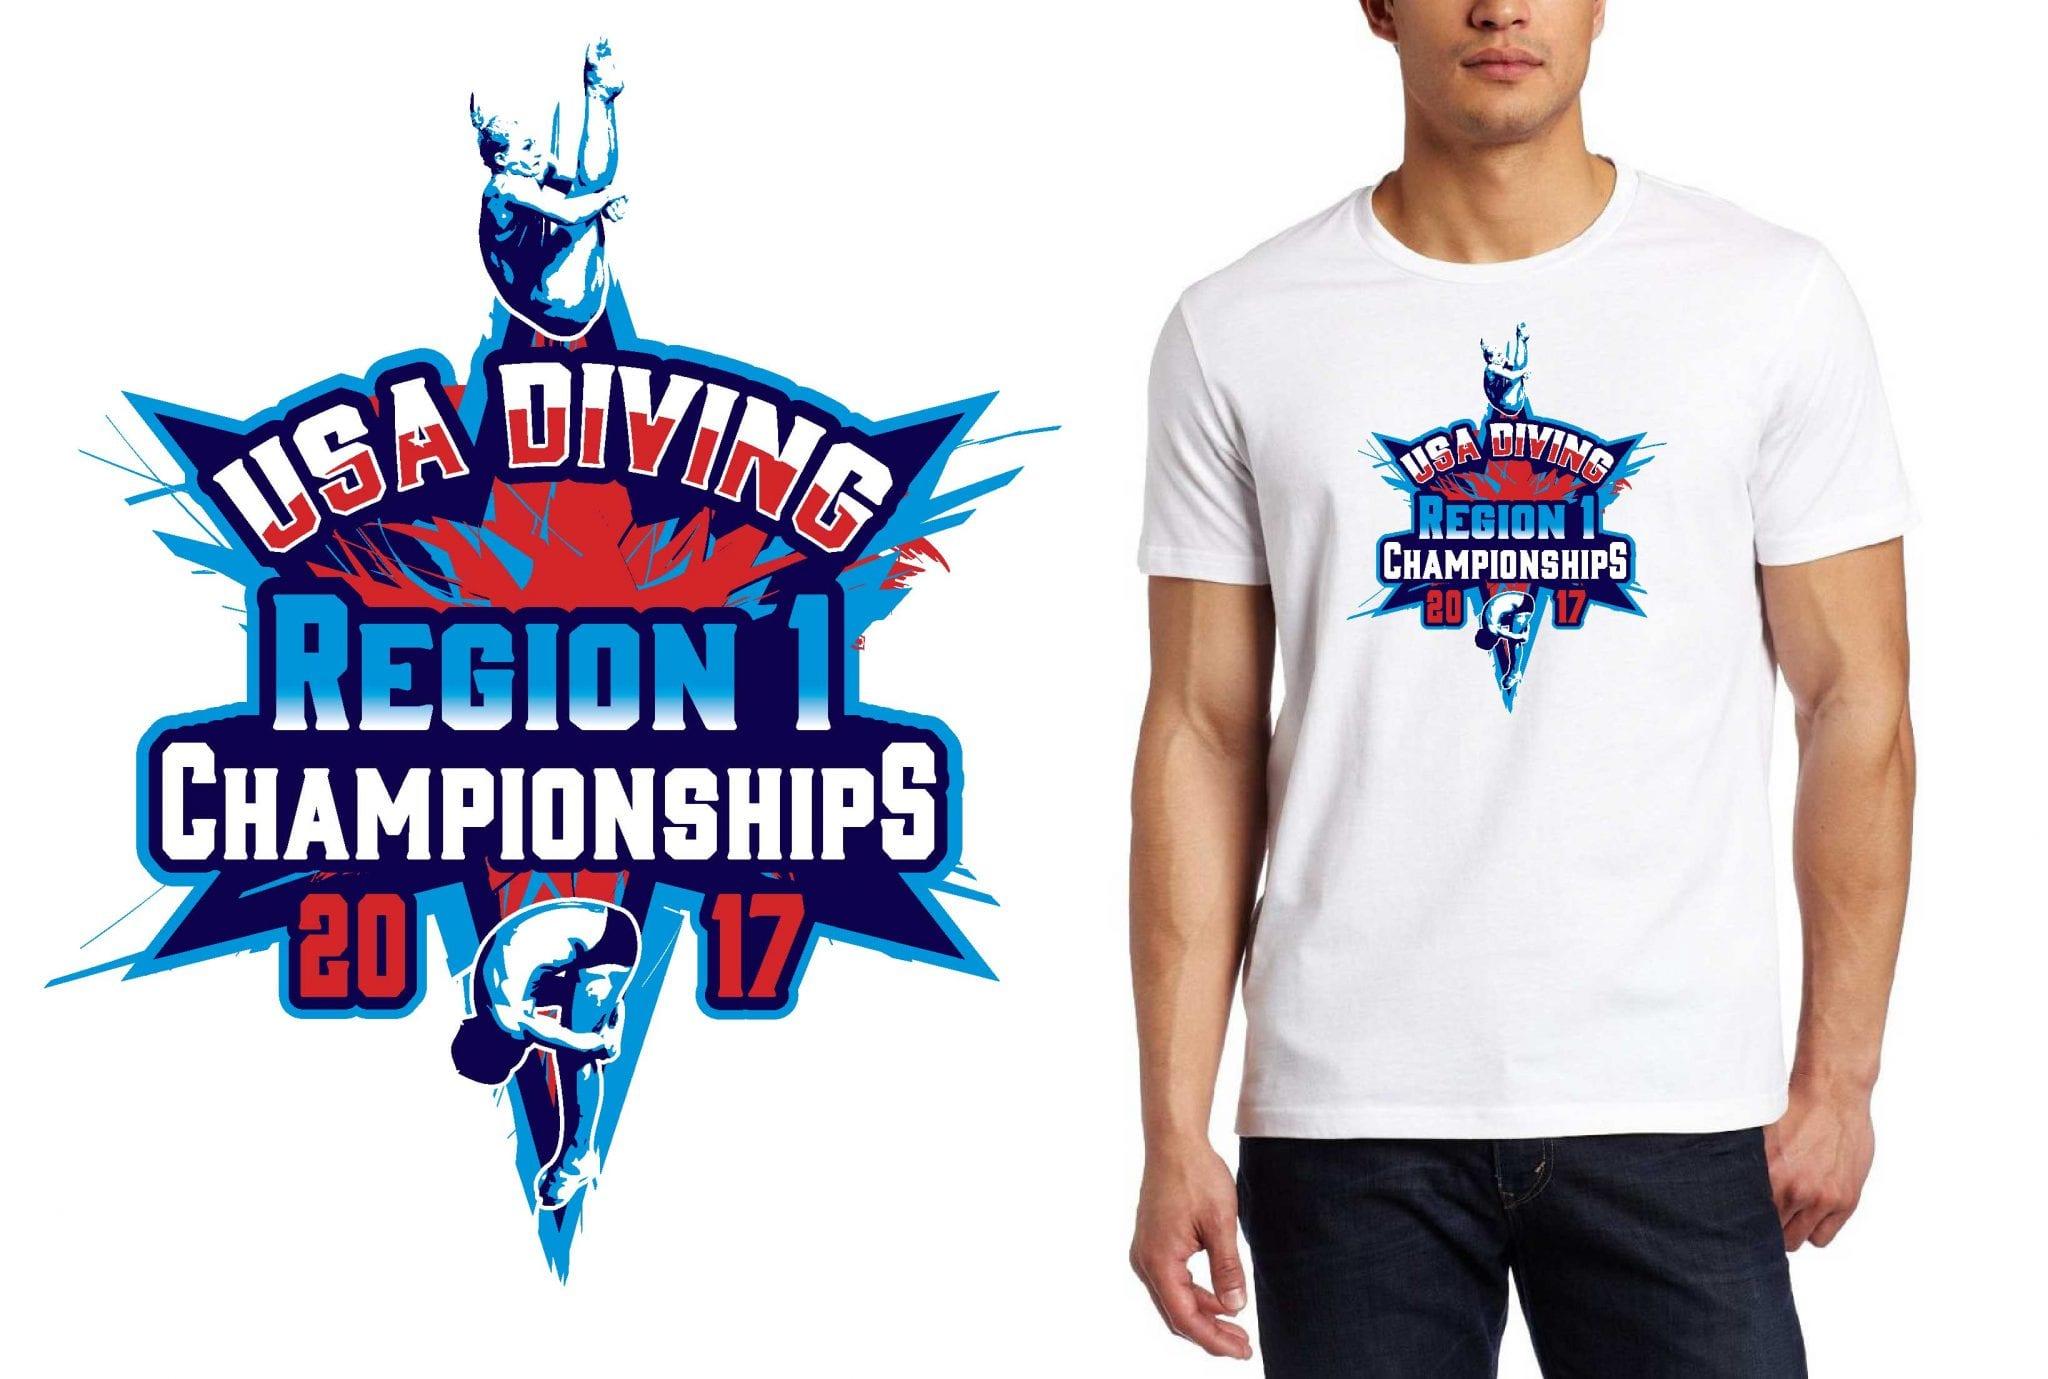 2017 USA Diving Region 1 Championships vector logo design for diving t-shirt UrArtStudio